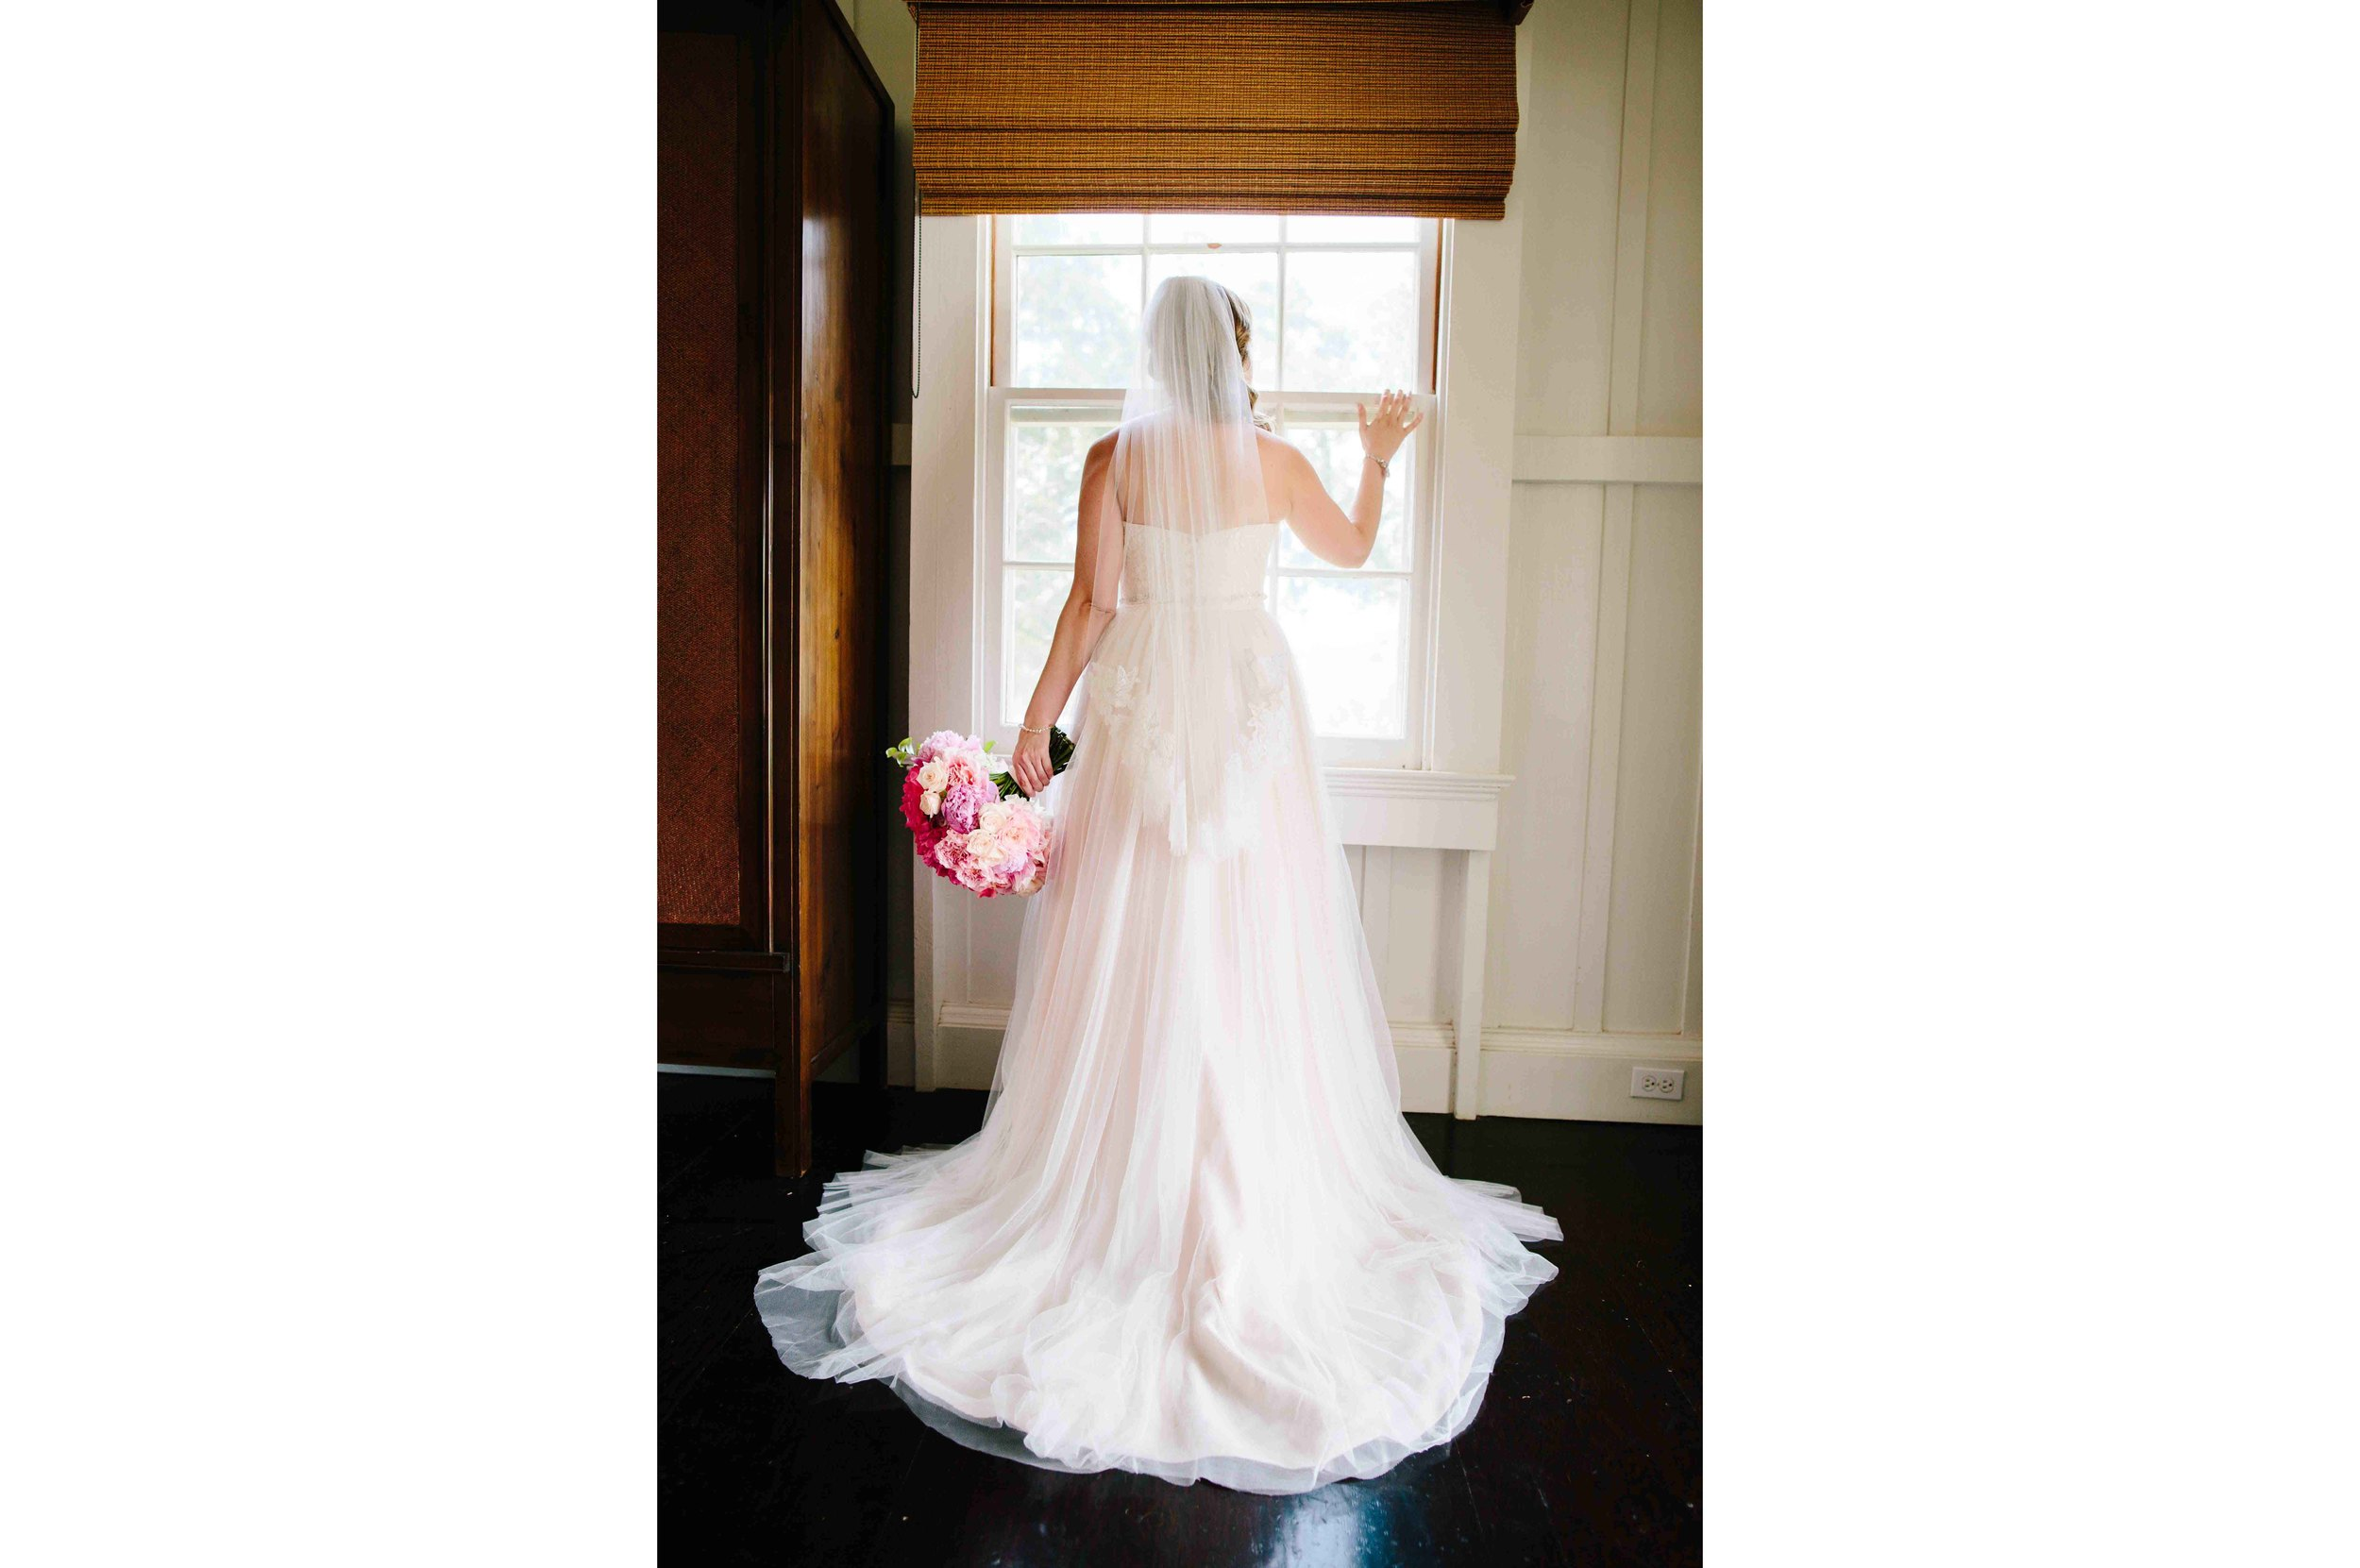 Dillingham Ranch Wedding Photography of Bride